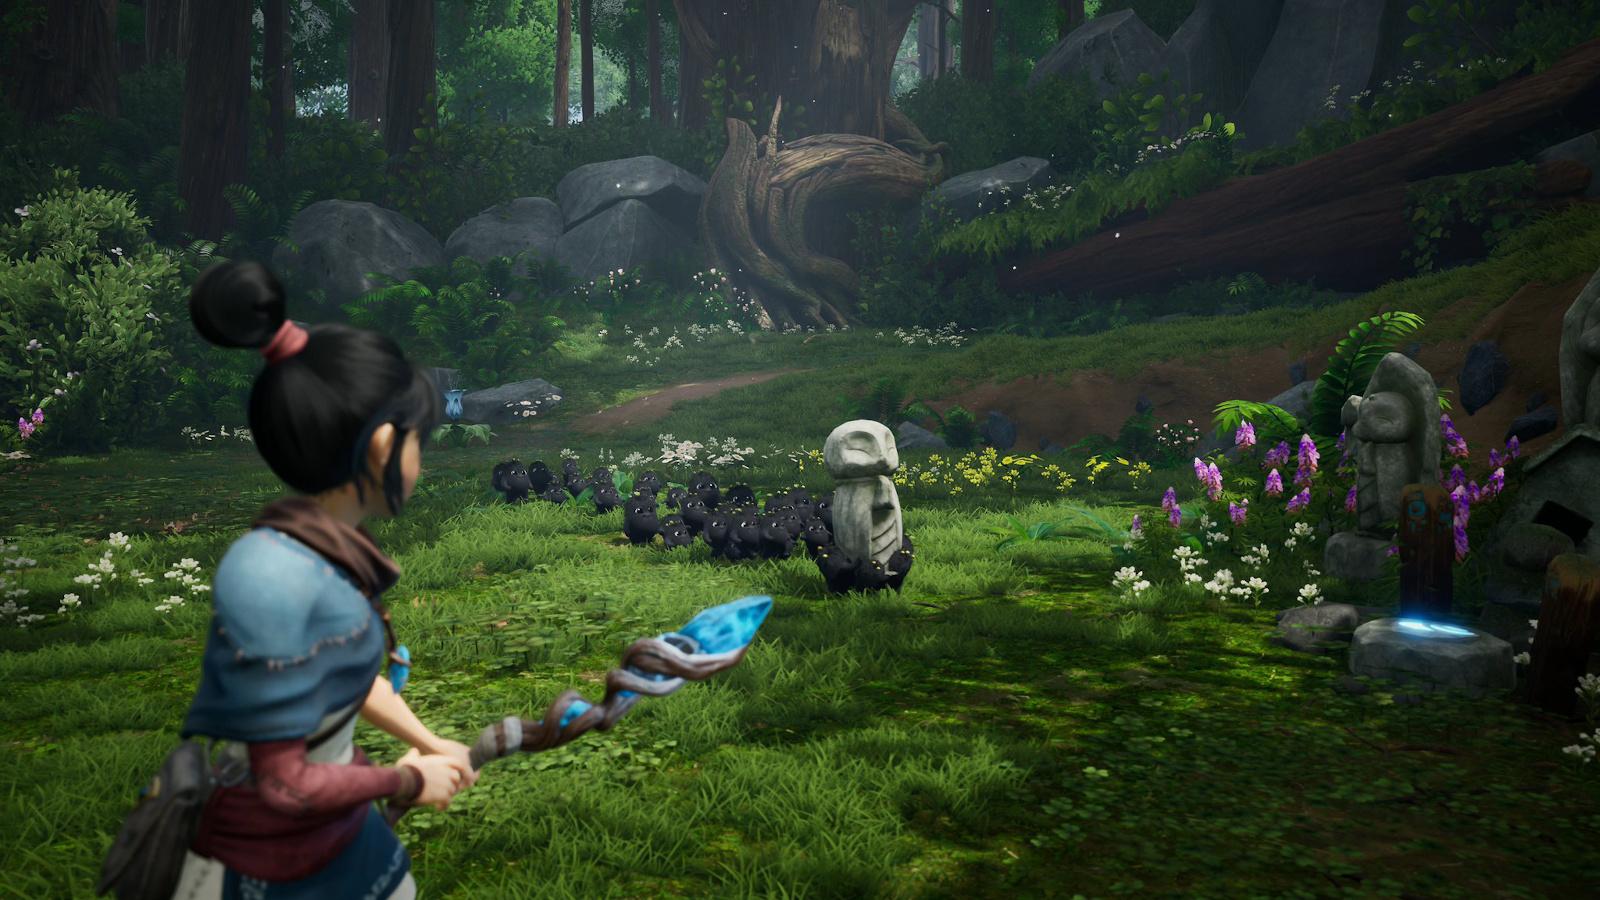 Kena: Bridge of Spirits' PS5 trailer shows off Pixar-like graphics   Engadget